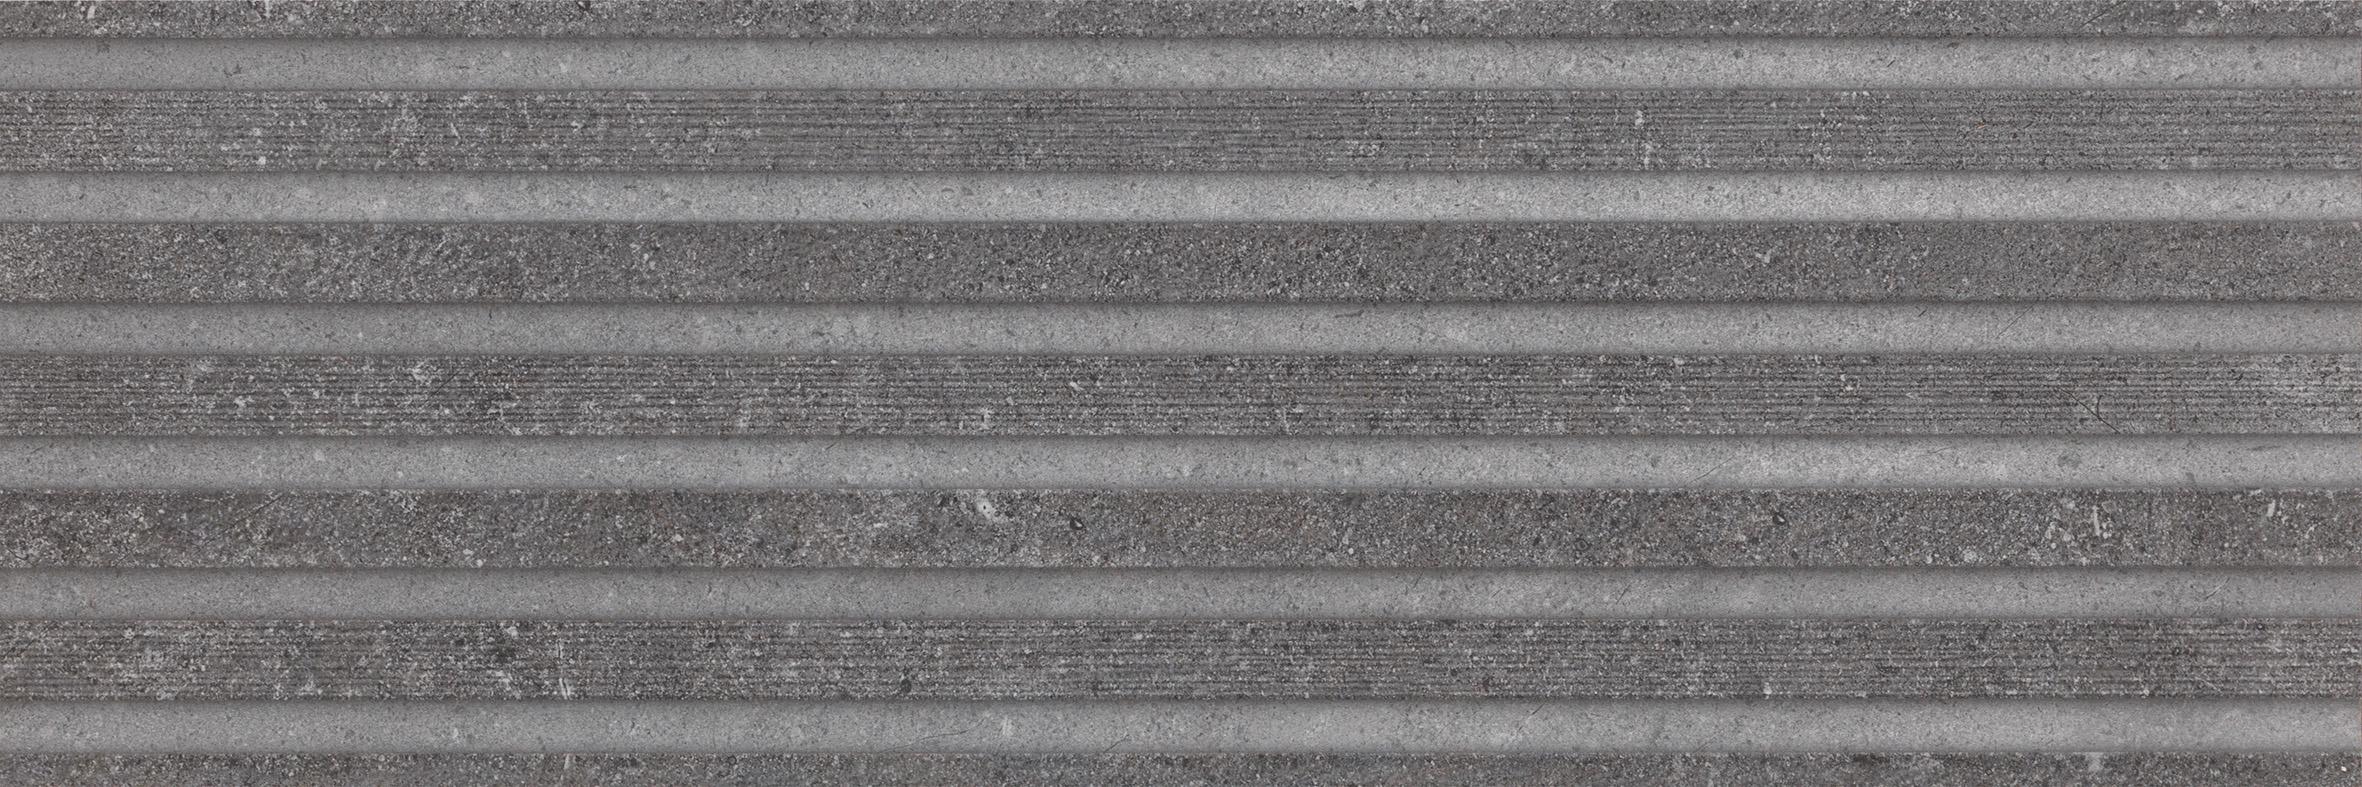 PF00013057_Ecoproject 2060 mur. Grey_smoke ret_3